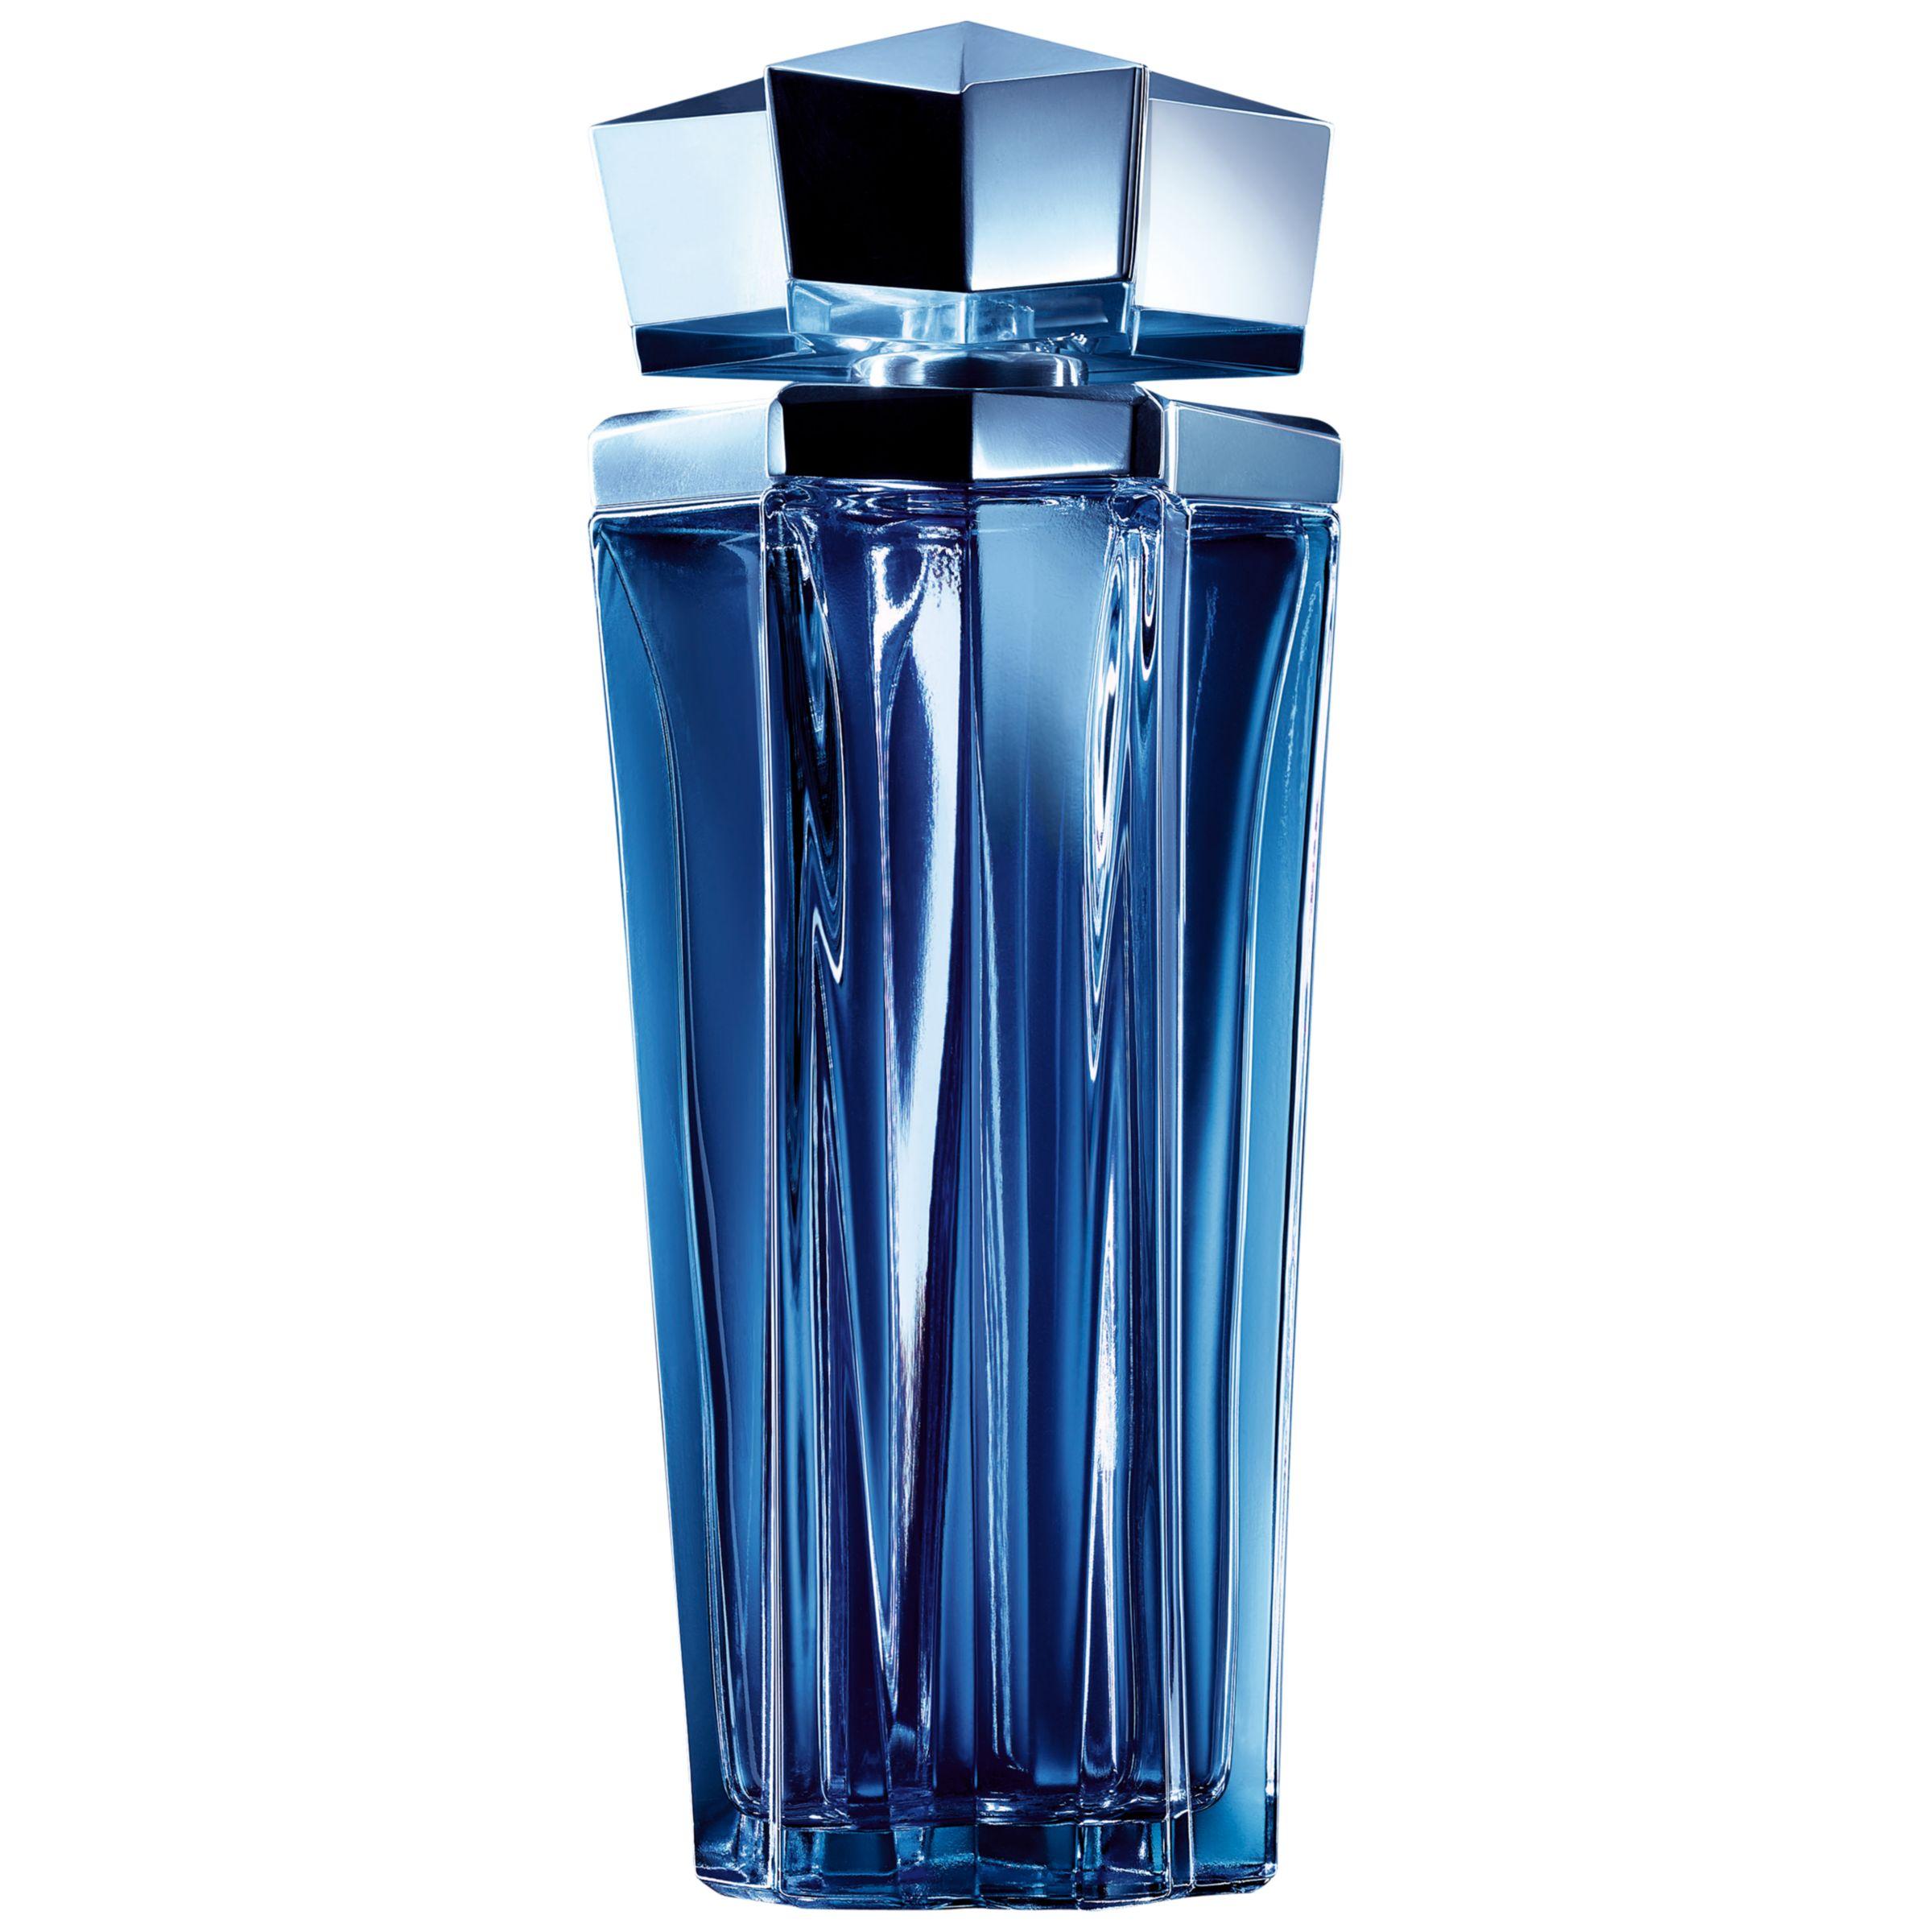 Mugler Mugler Angel Rising Star Eau de Parfum Refillable Bottle, 100ml